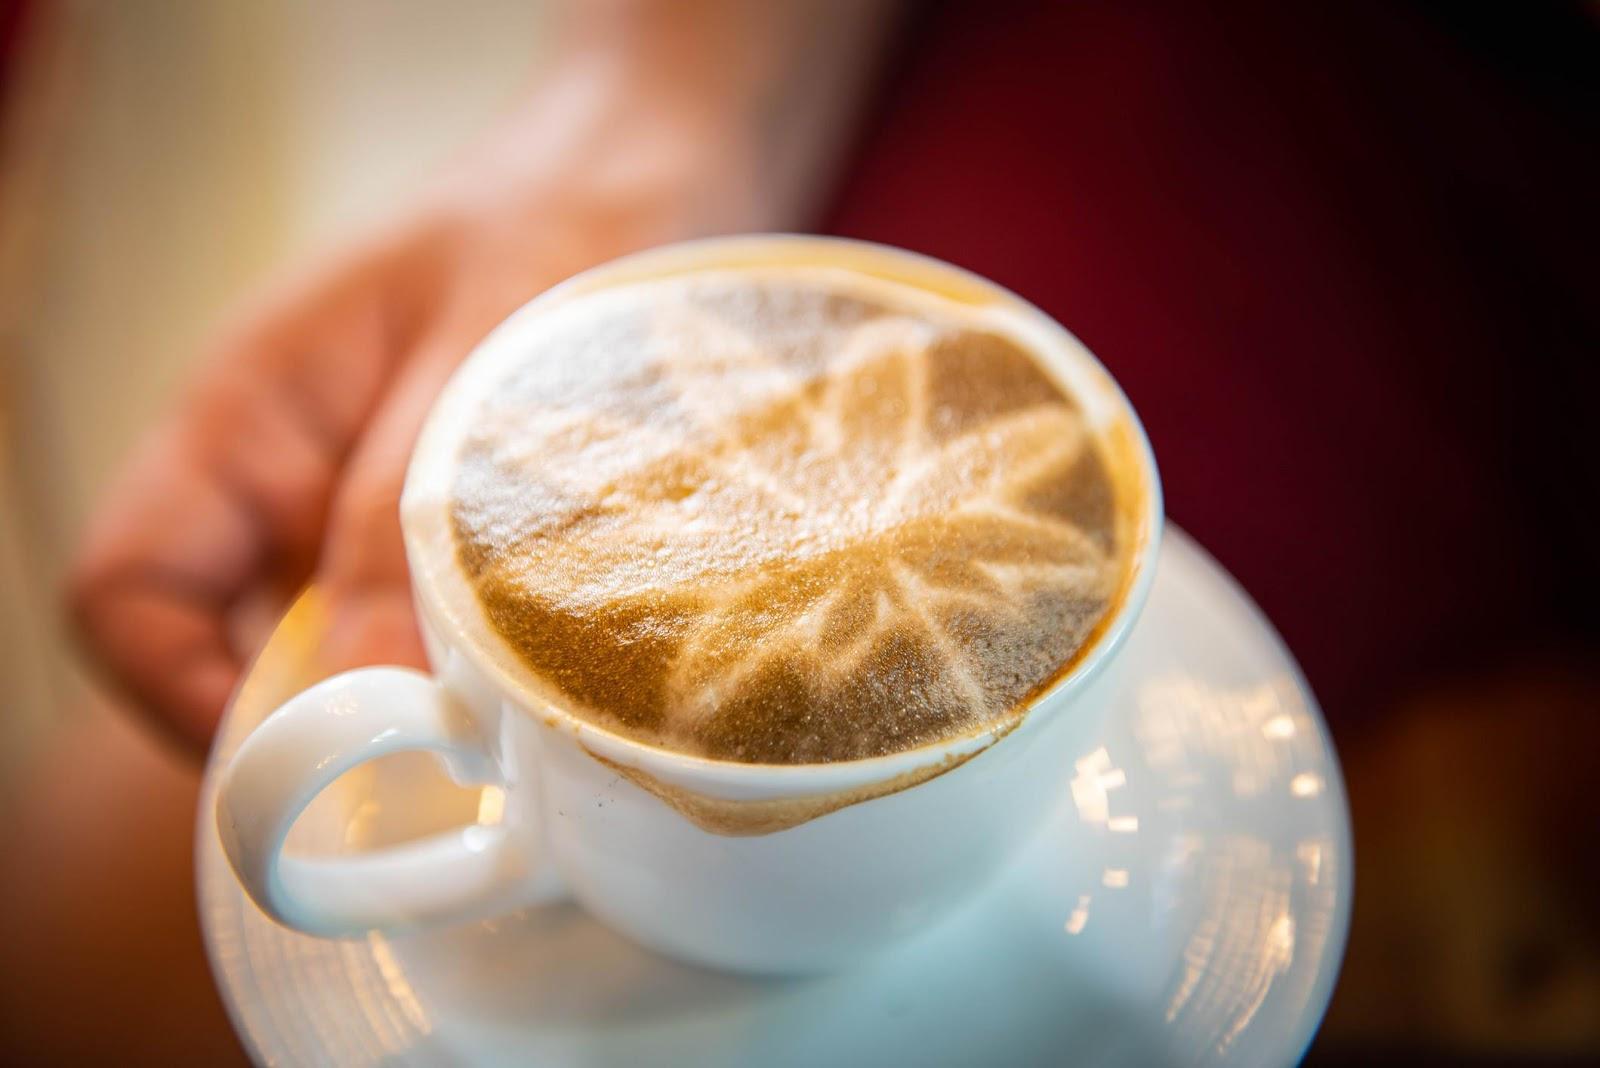 CBD Infused Coffee: Is Mixing CBD Oil & Morning Coffee A Good Idea?